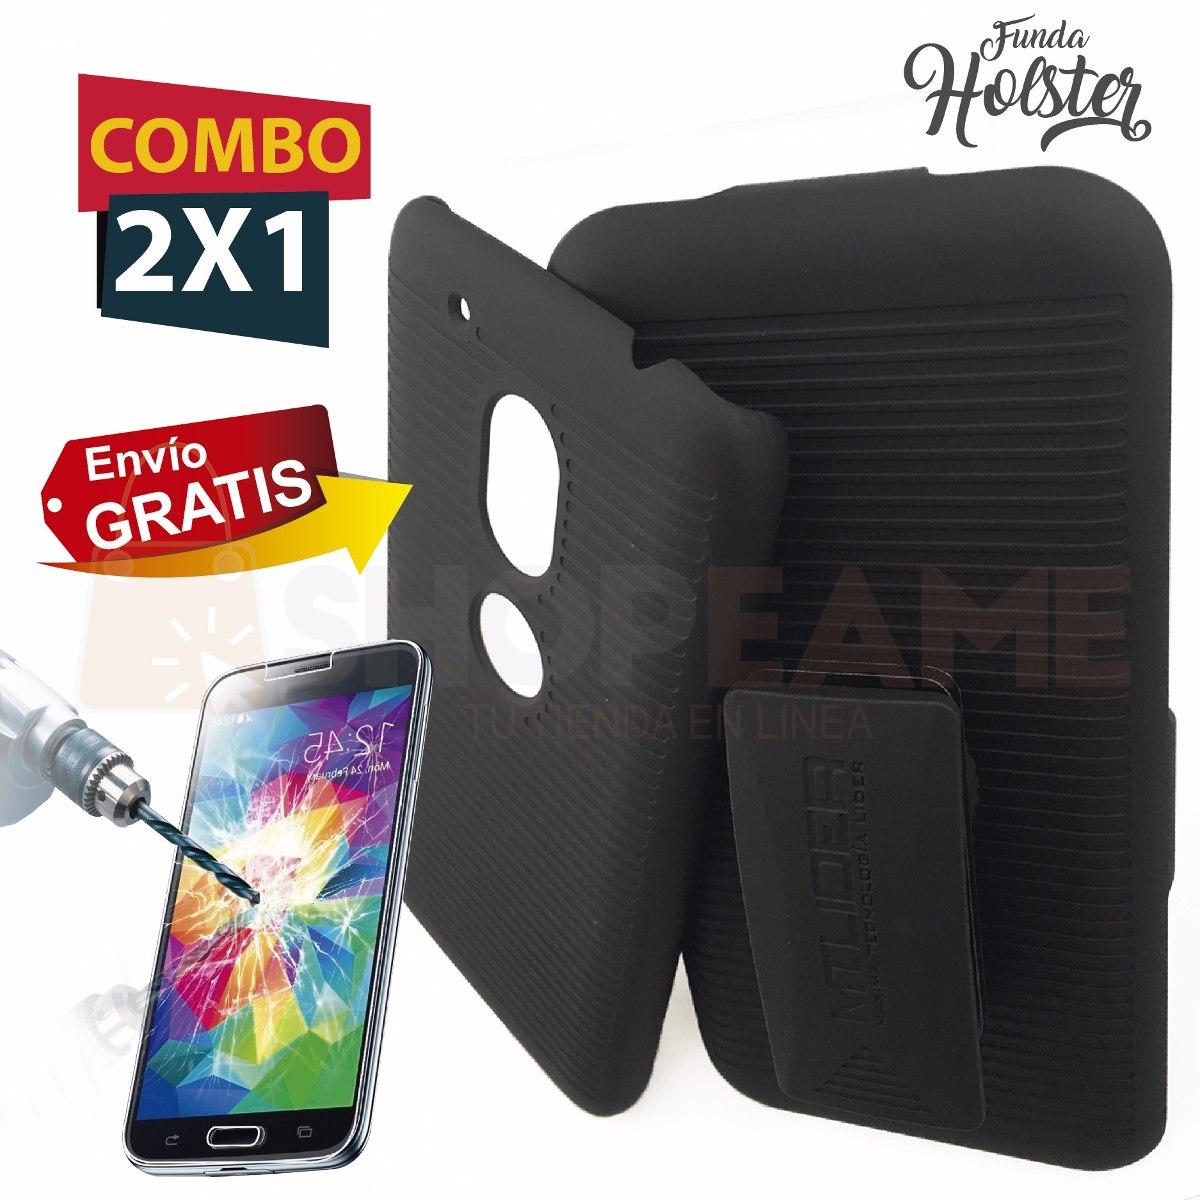 cfd117a8c30 funda protector holster case clip + cristal moto g4 play. Cargando zoom.